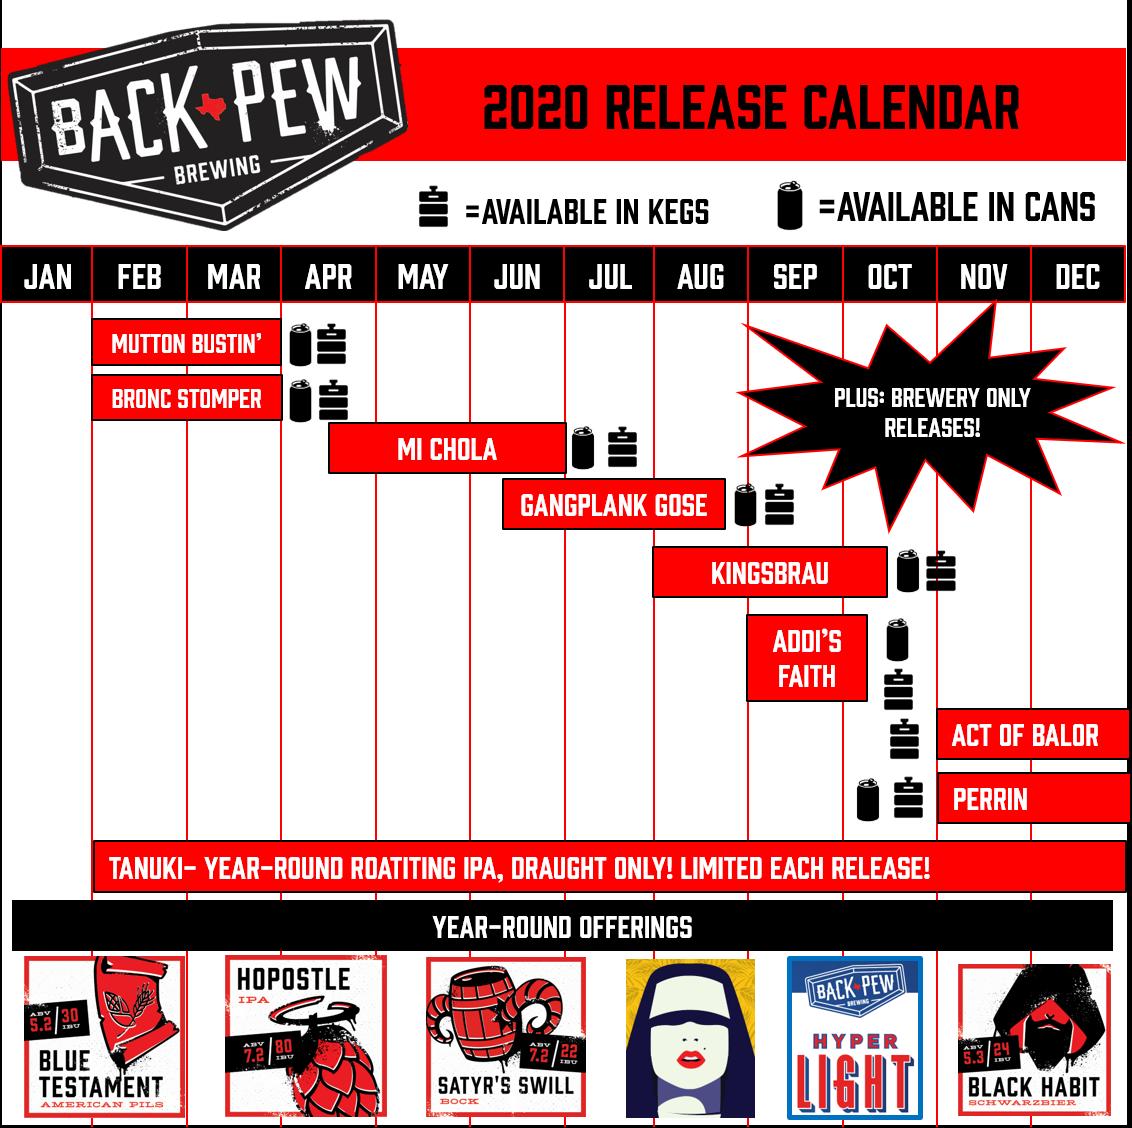 PorchDrinking 2020 Beer Release Calendar